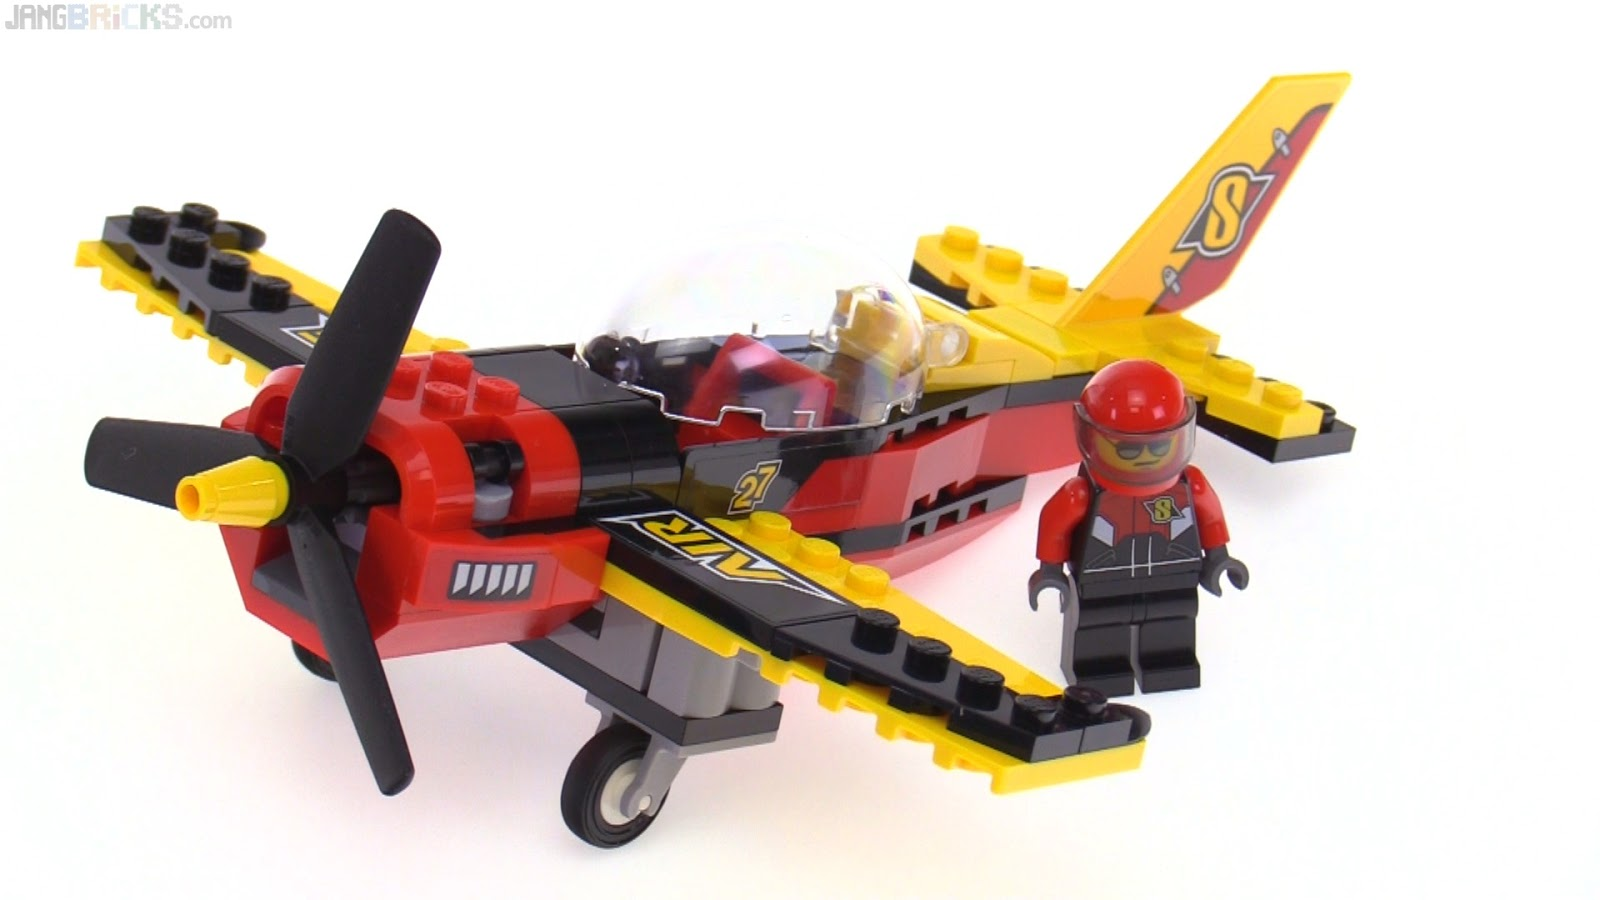 how to build a lego plane